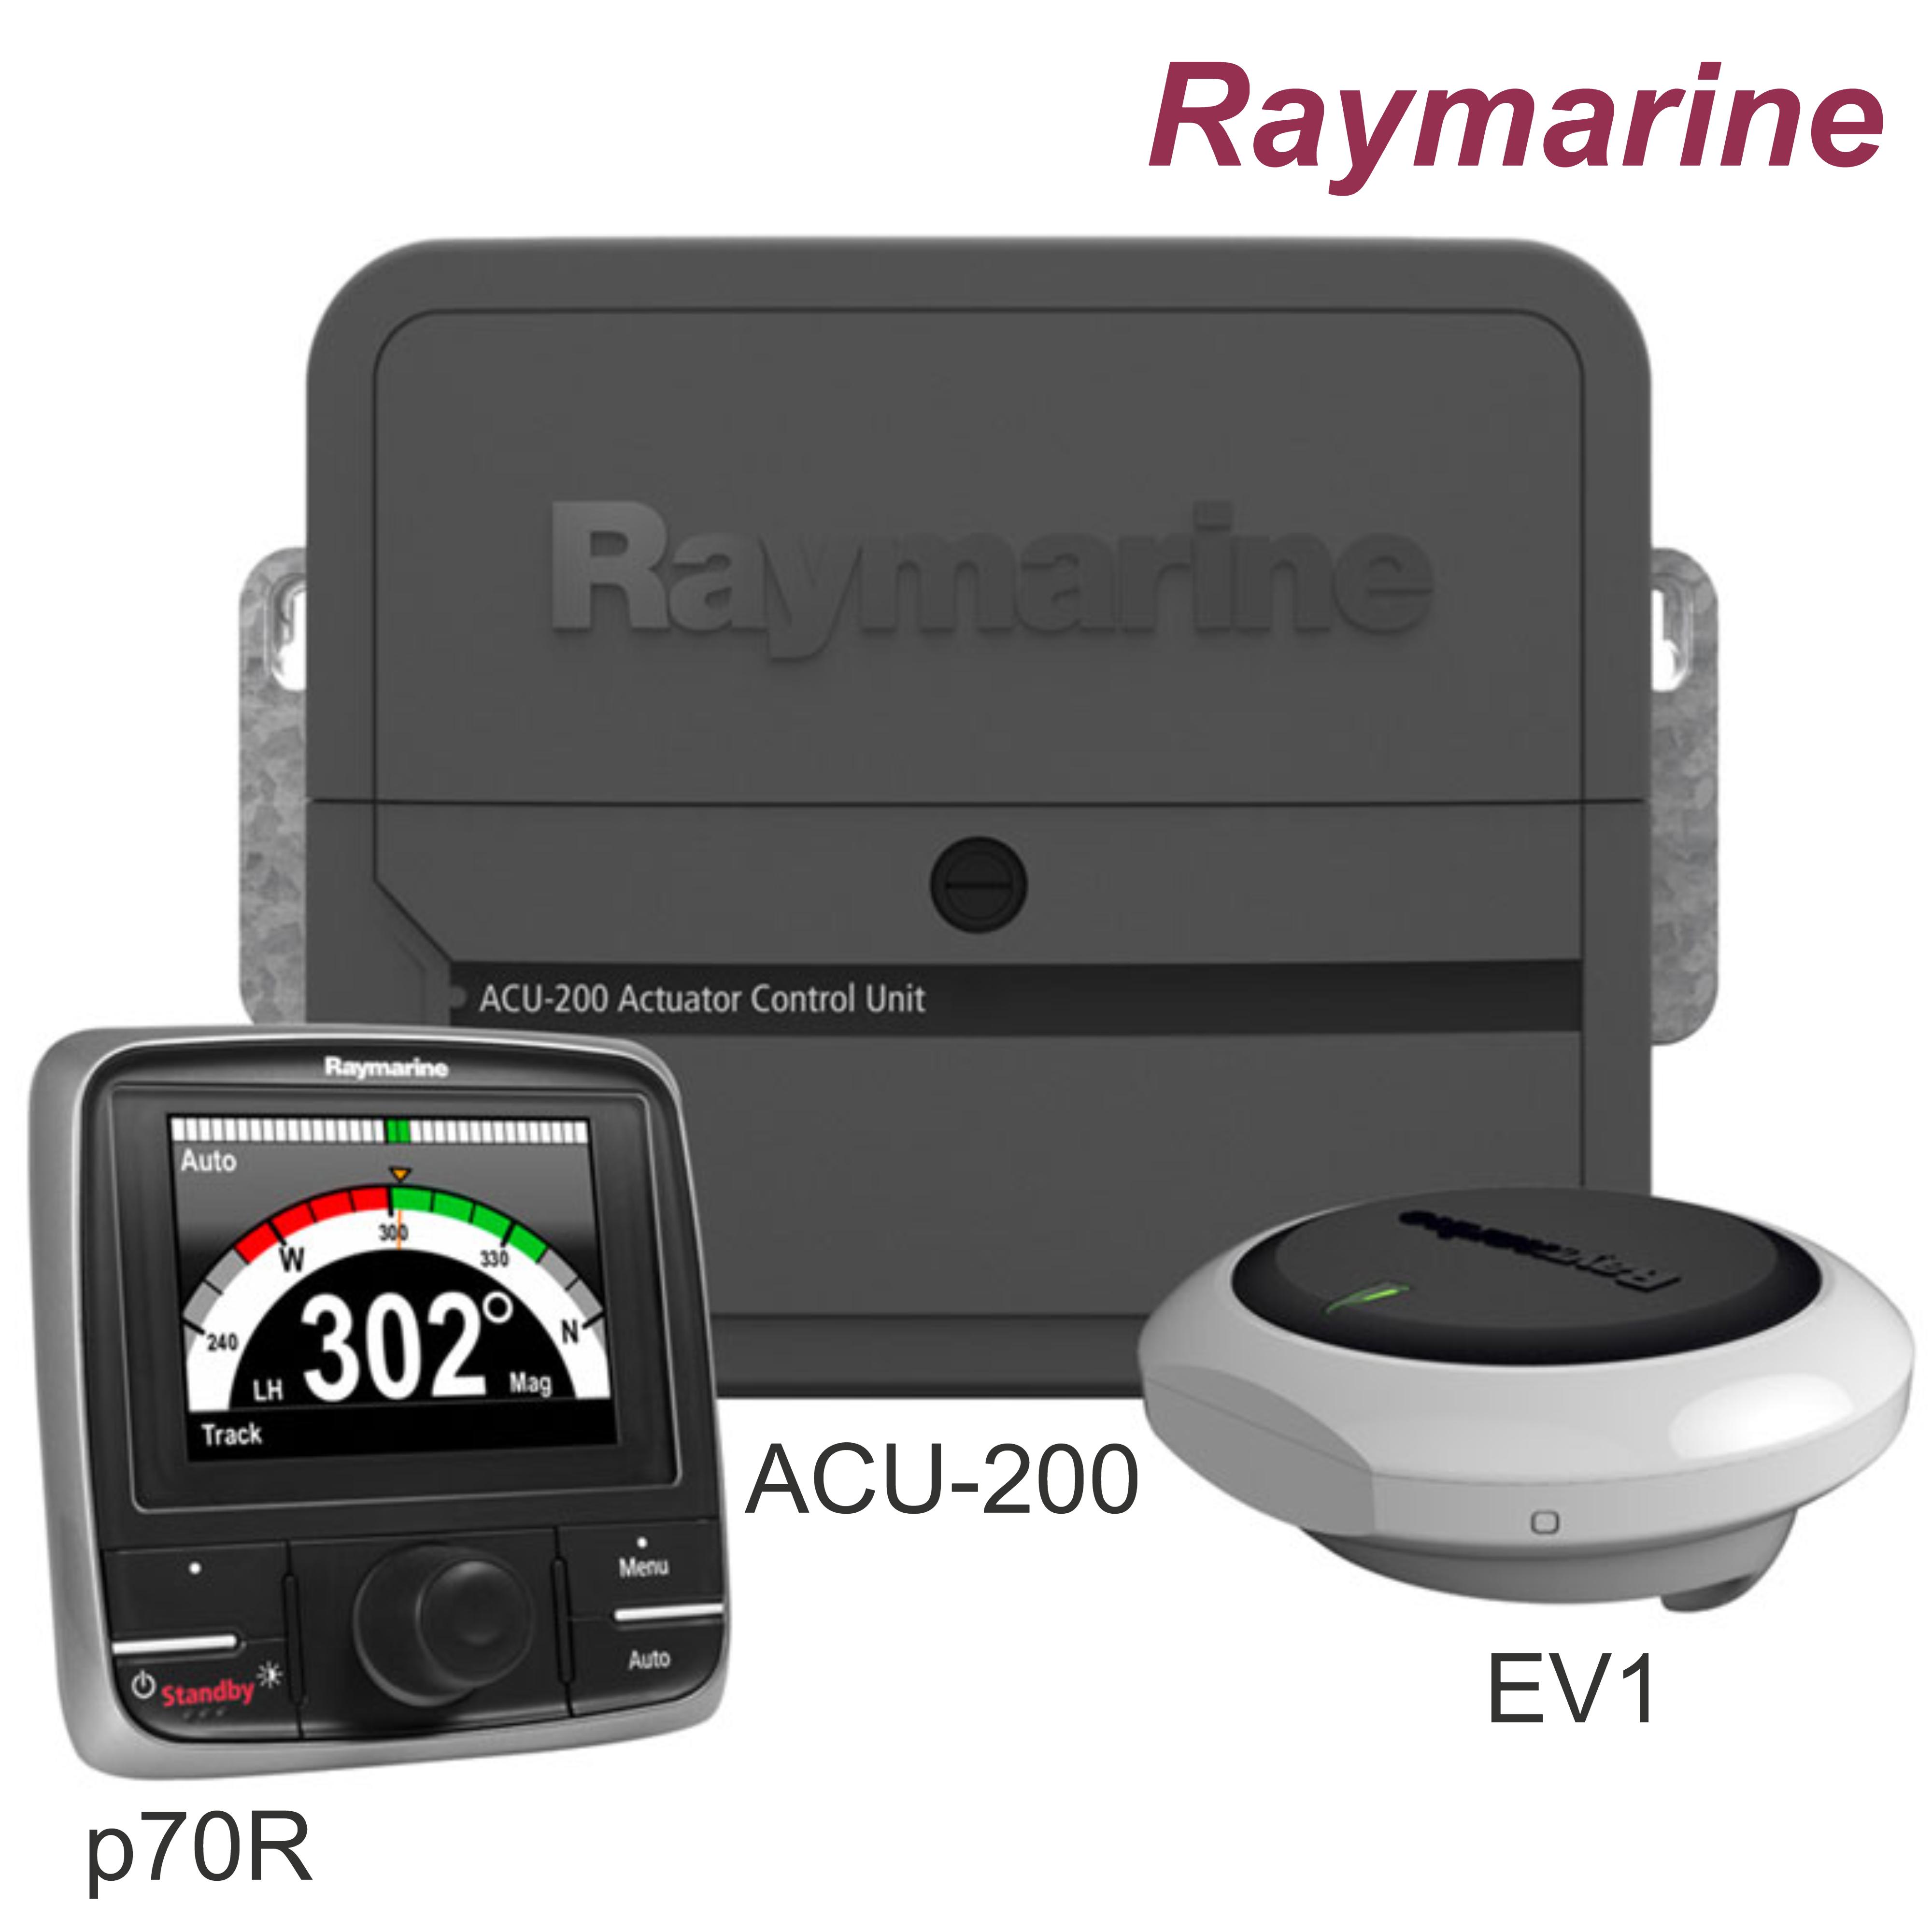 Raymarine-T70156|Evolution Autopilot|Control Head|ACU-200|Drive Unit|For Marine